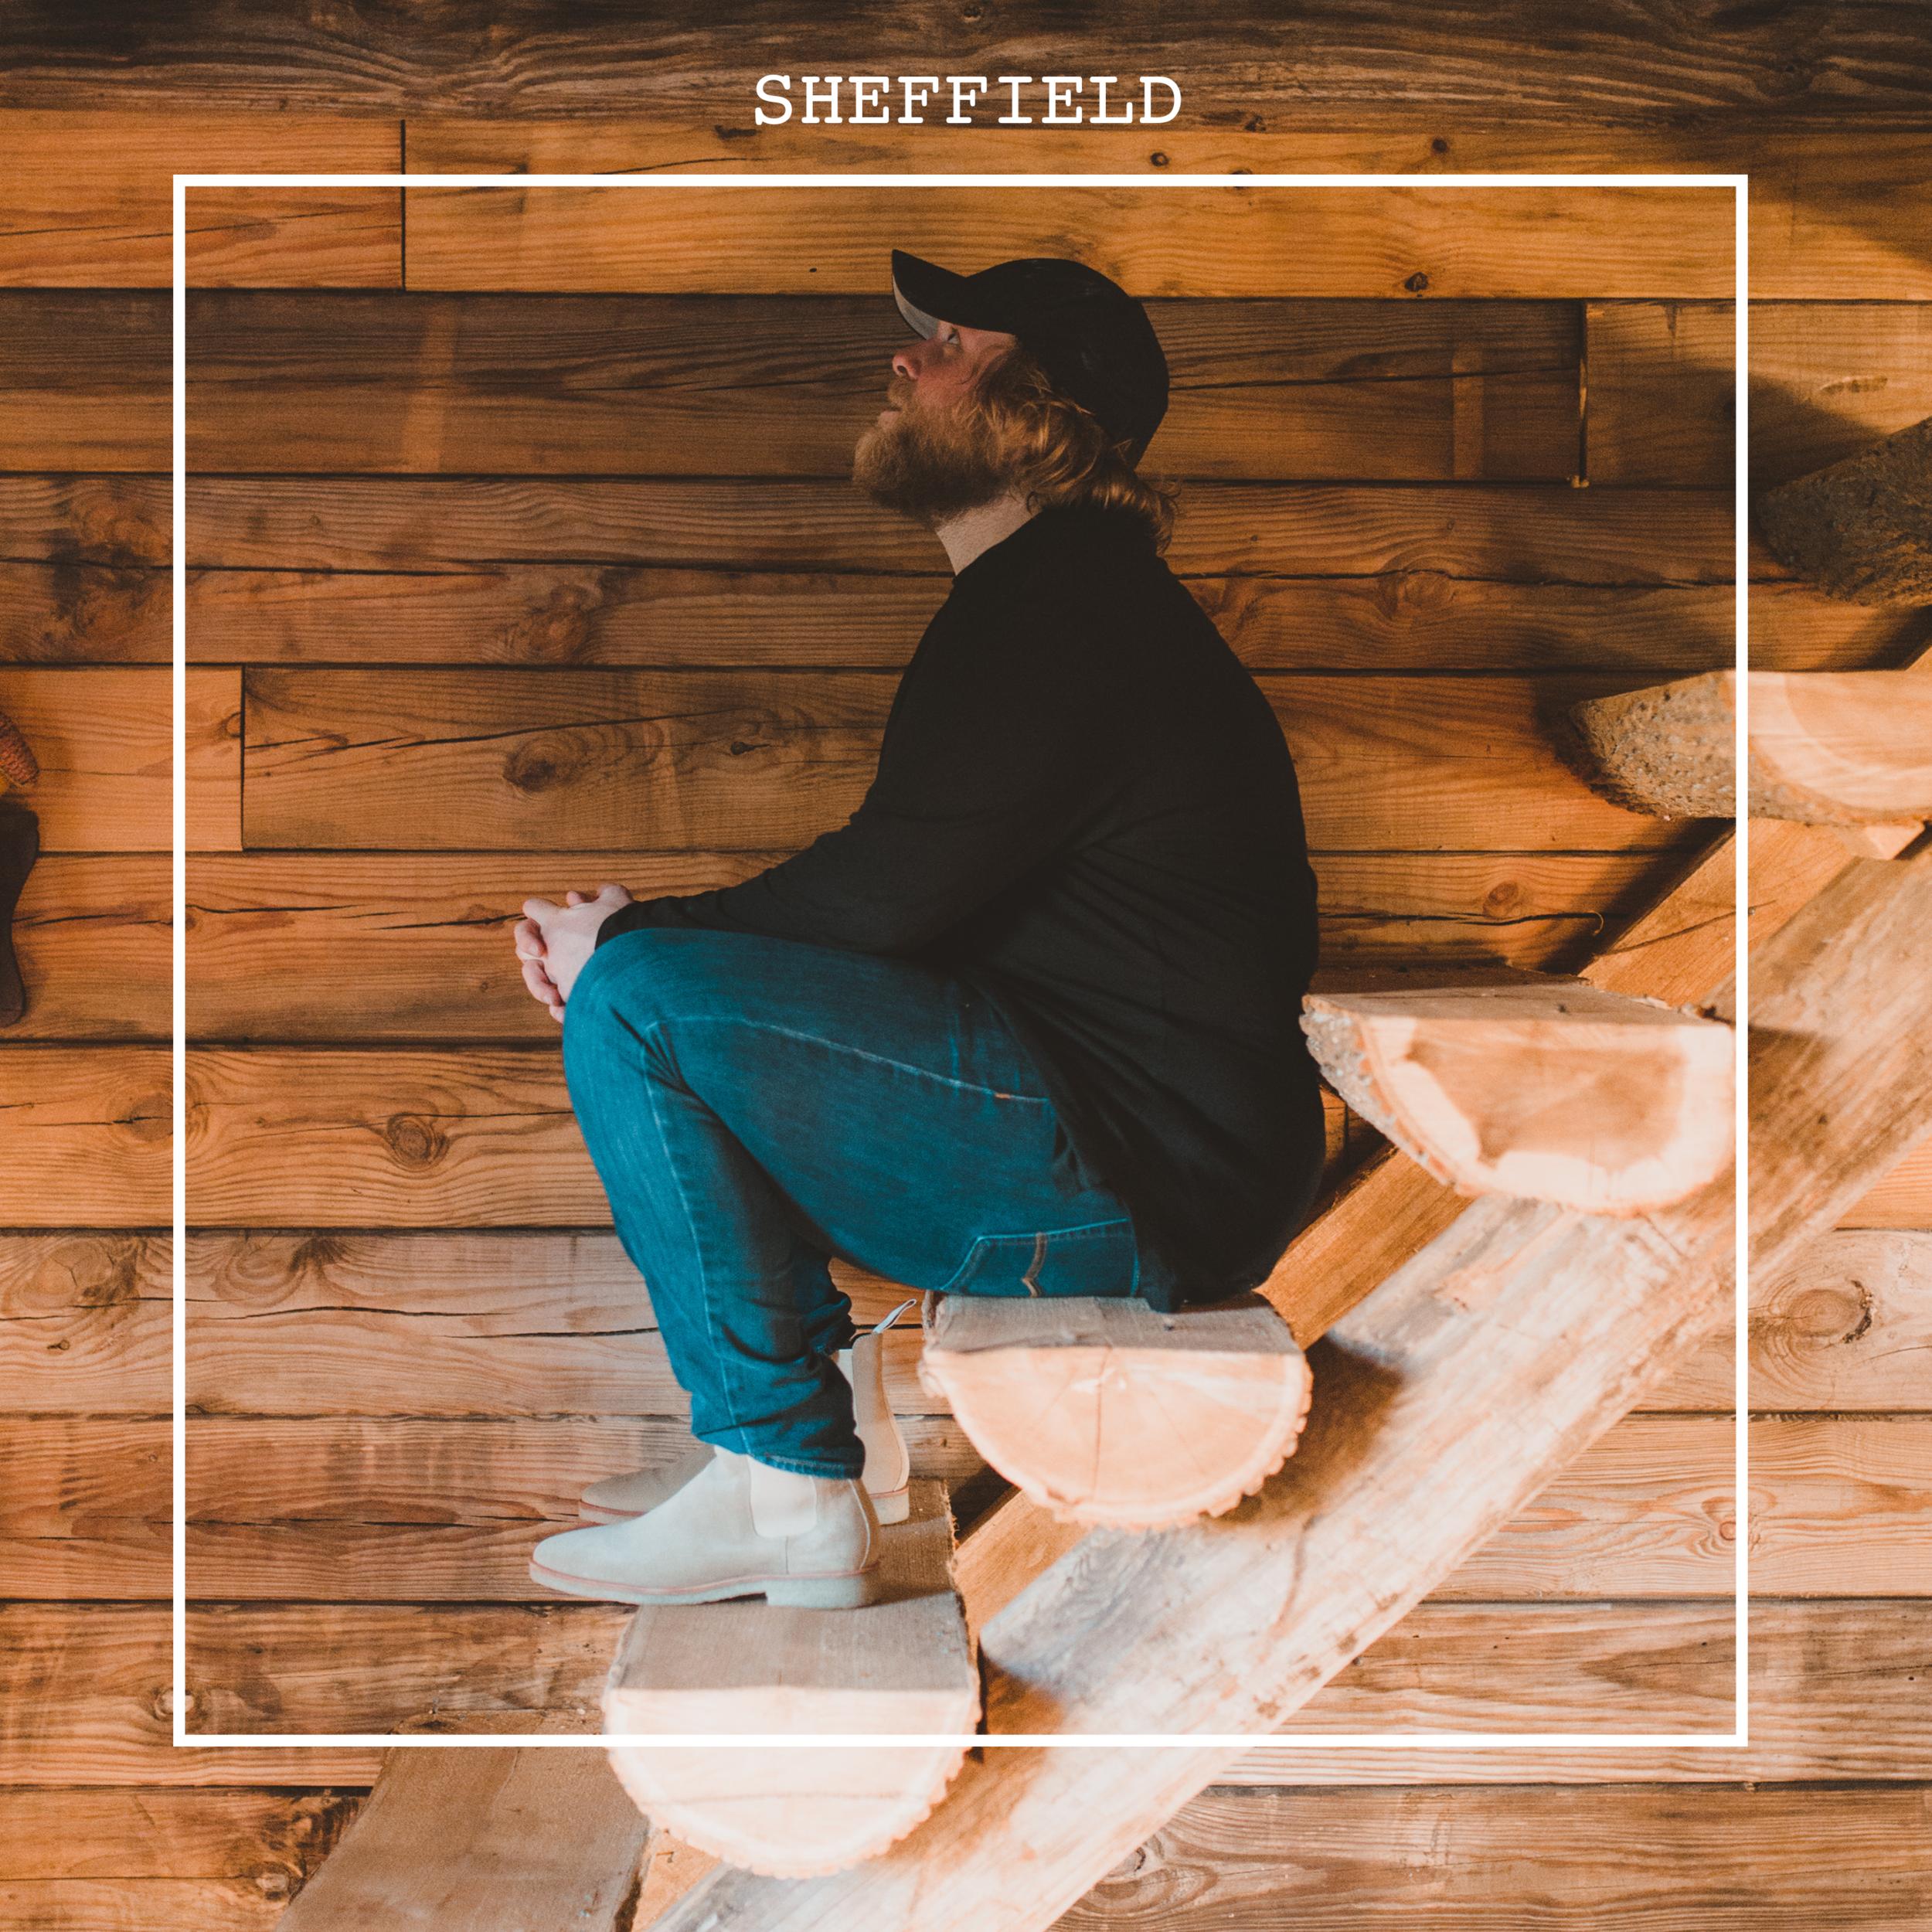 SHEFFIELD ALBUM ART(1).png